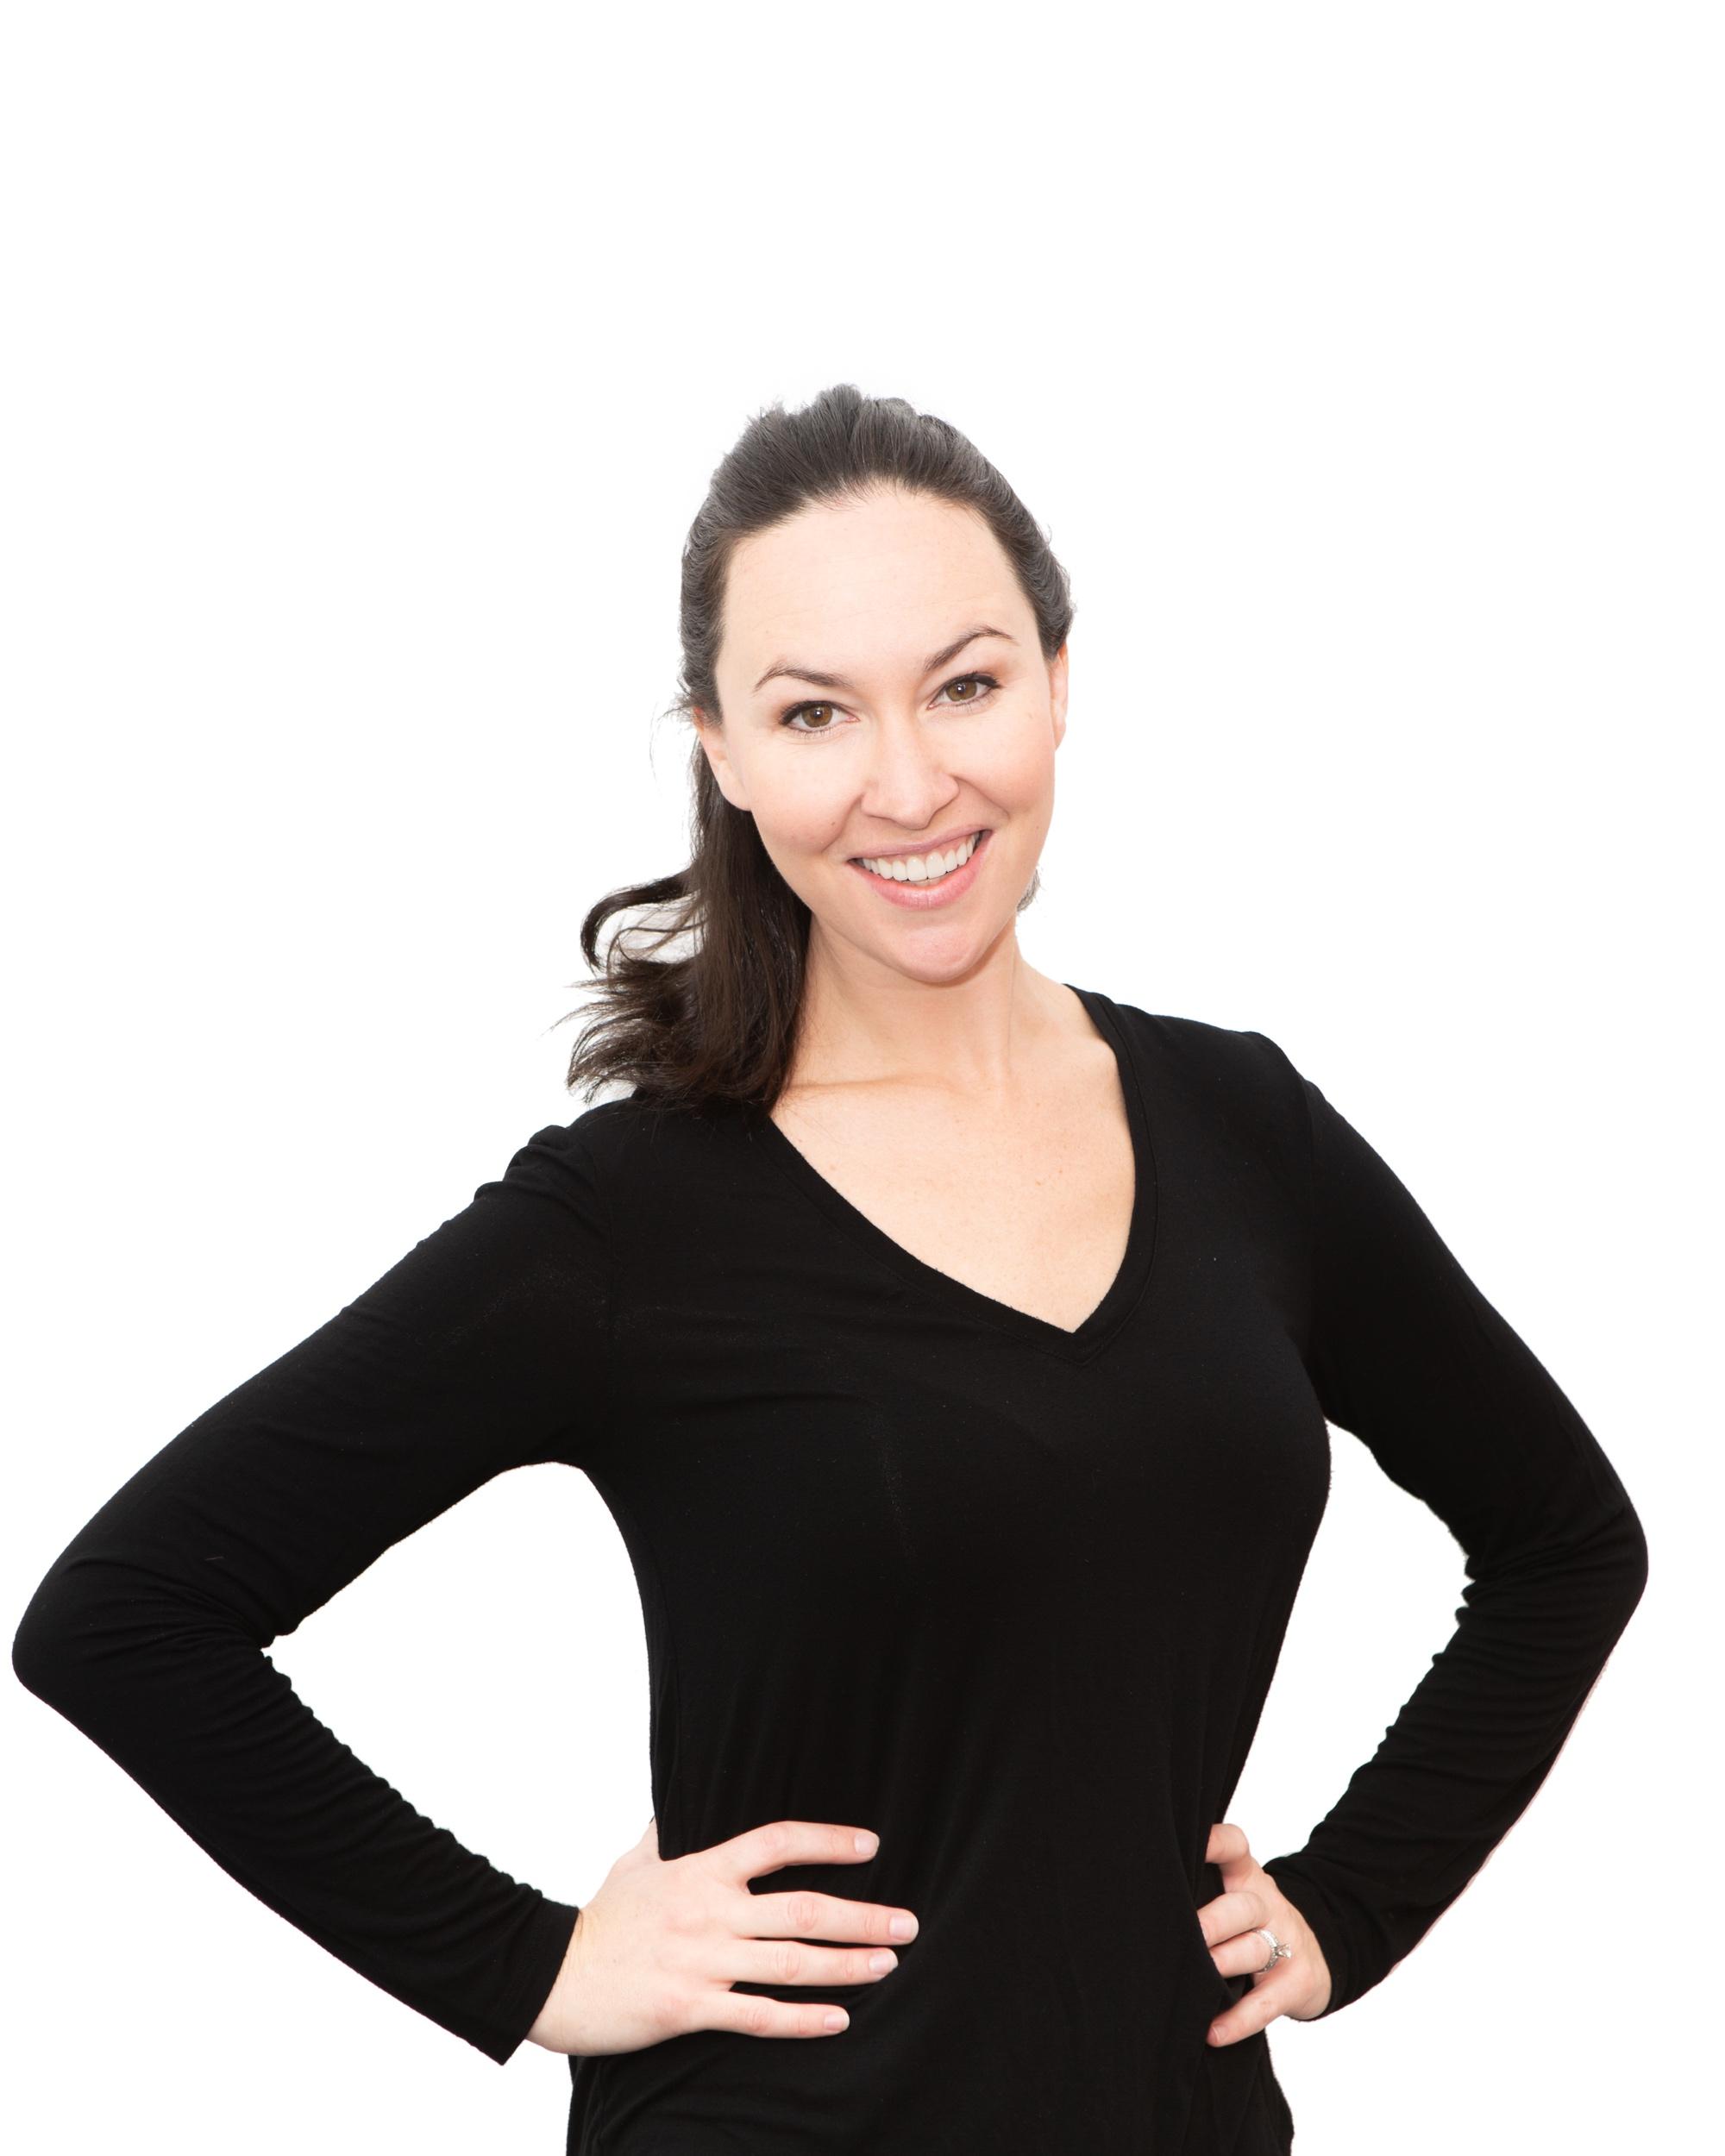 Ms. Morgan Revier, Studio Owner